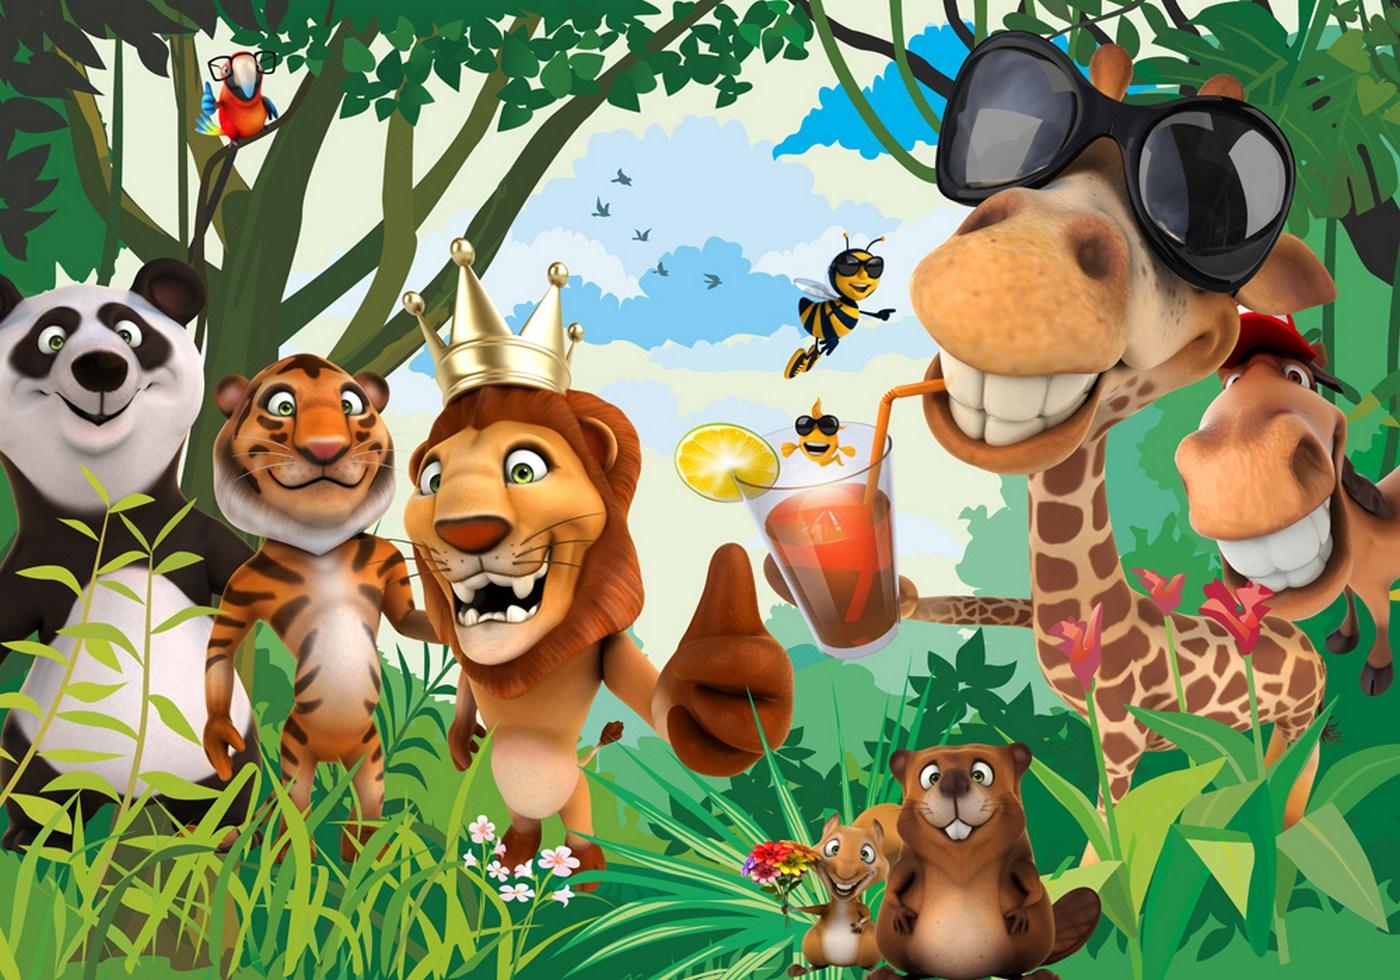 Dschungel Tapete Kinderzimmer | Kiss Fototapeten Zu Besten Preisen Fototapete Jungle Animals